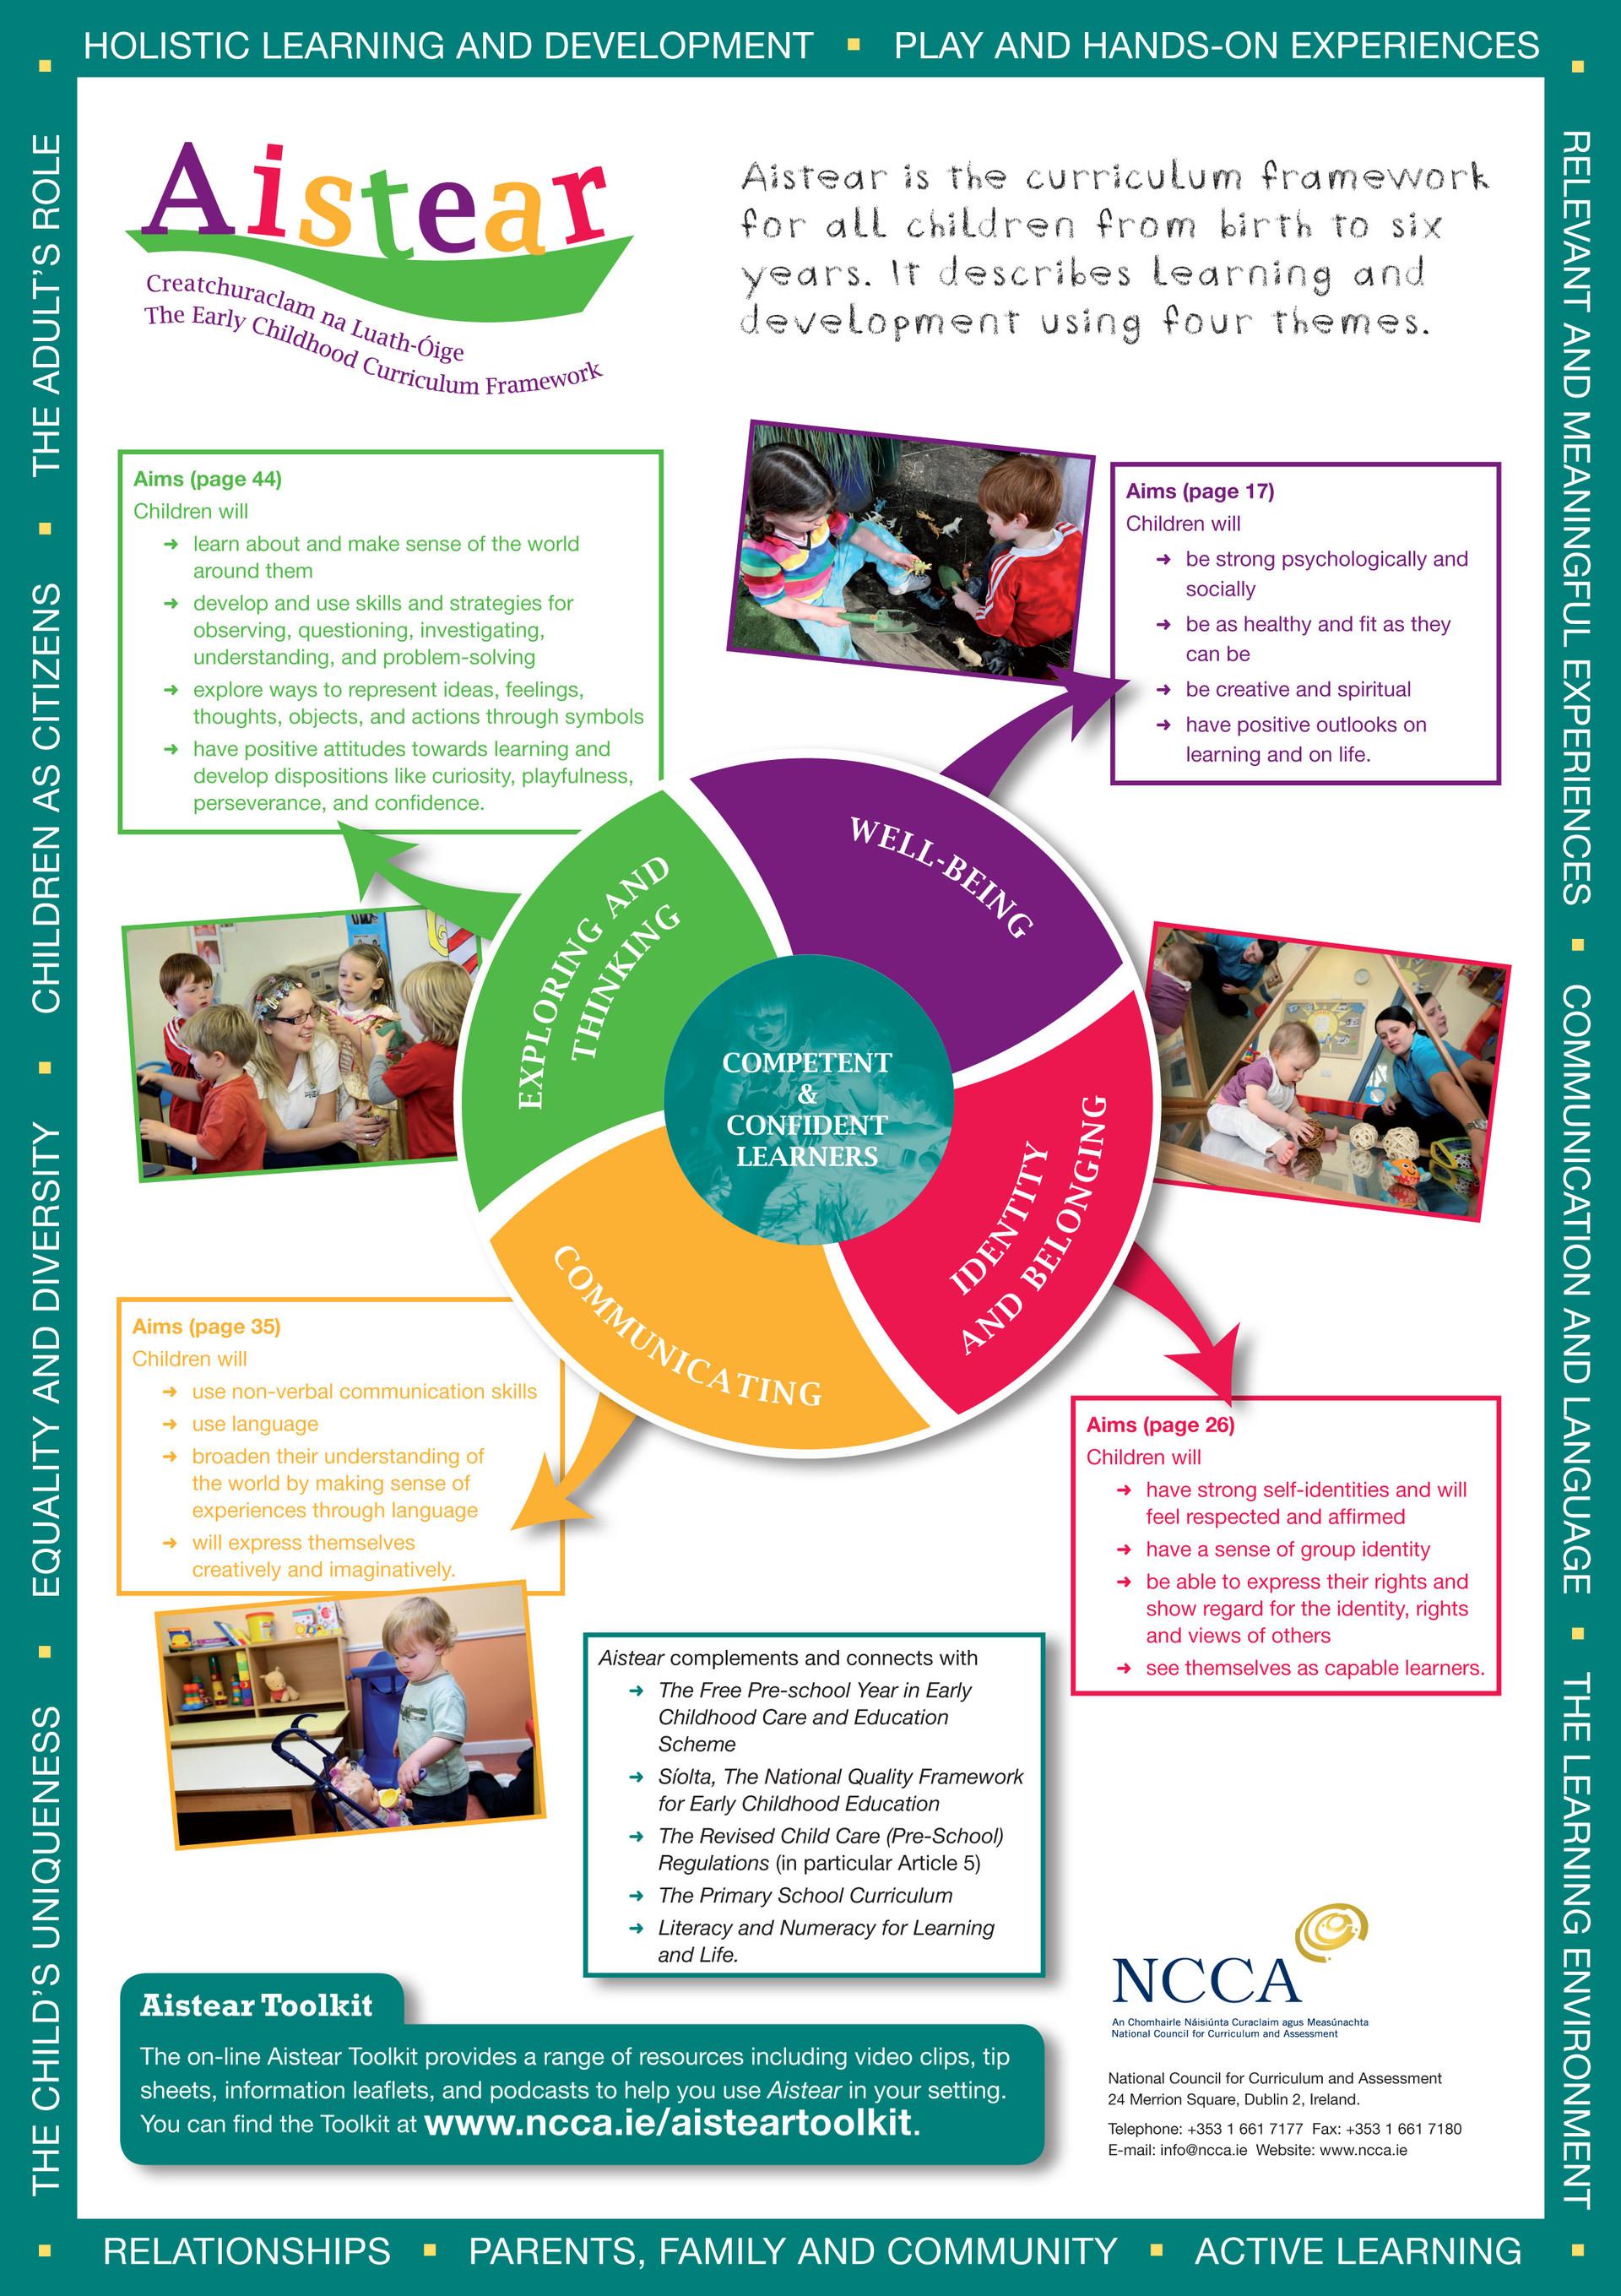 Trabajo Educador Infantil en Irlanda. | Blog Erasmus Irlanda